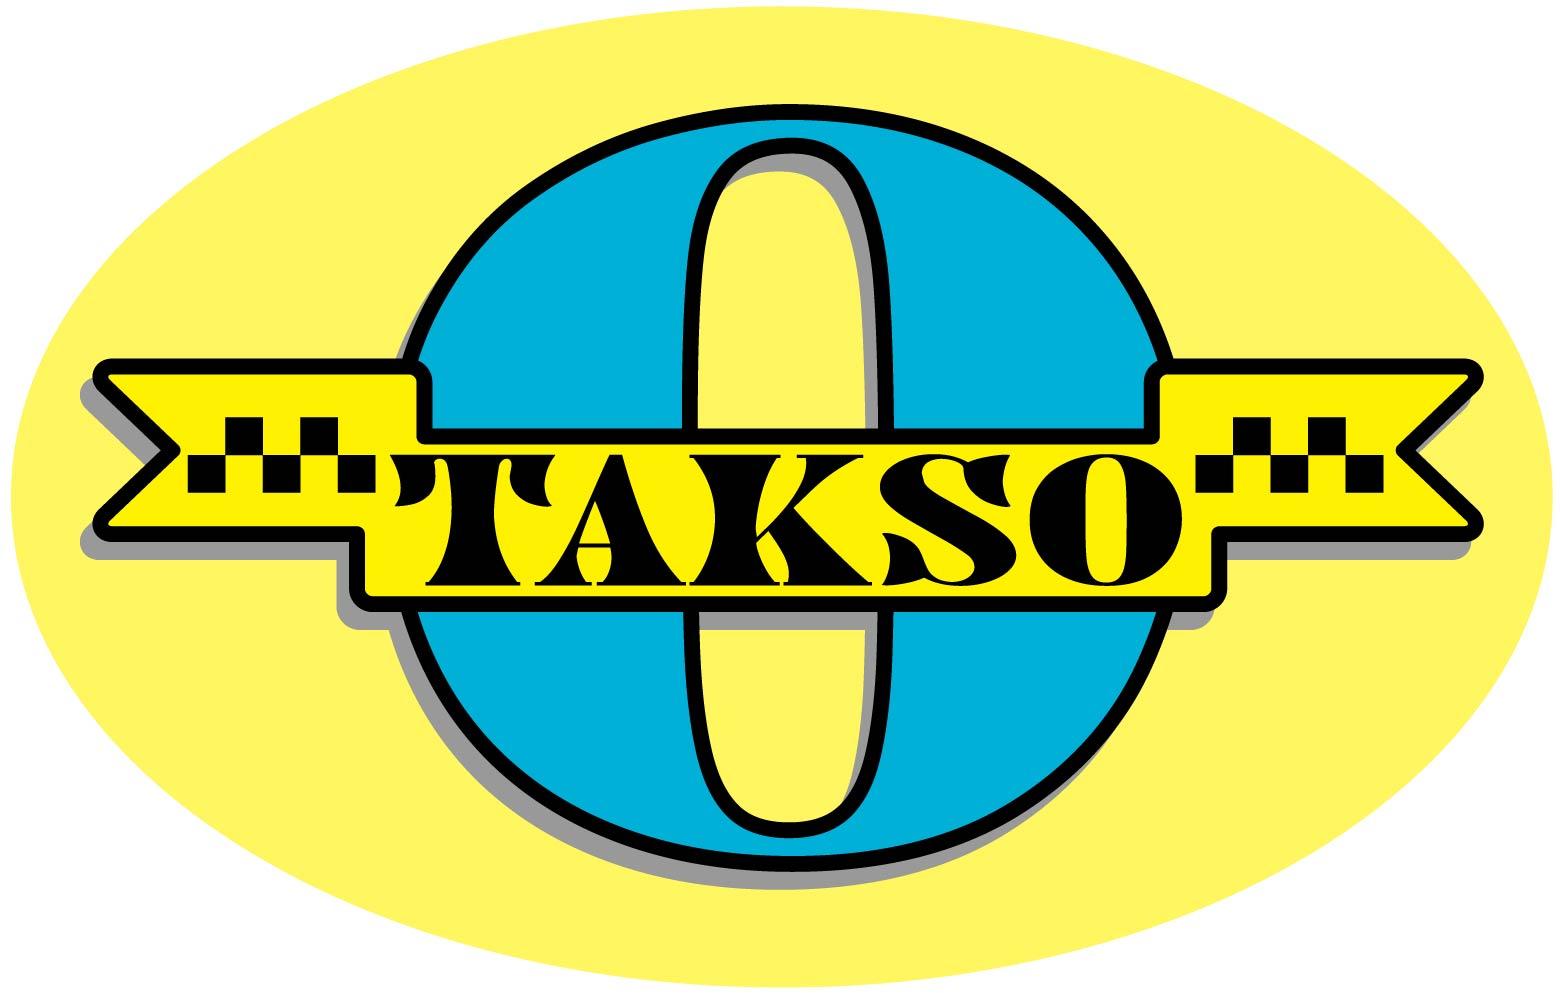 0-Takso